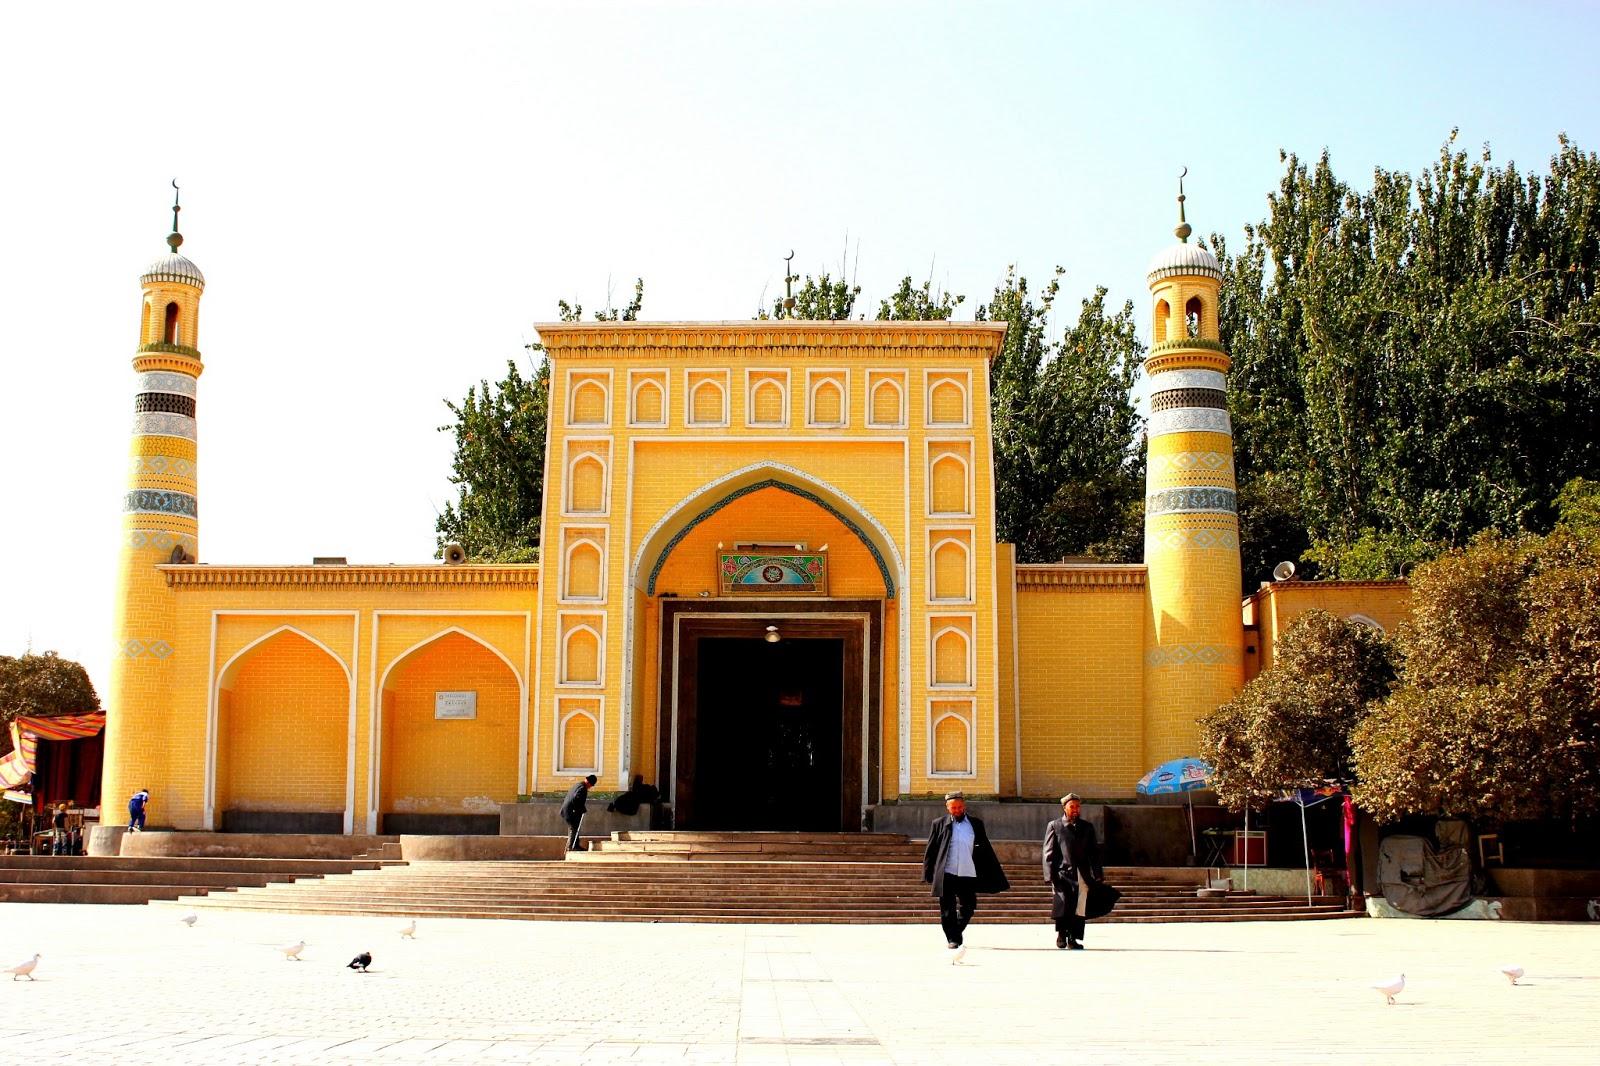 Картинки по запросу national geographic id kah mosque